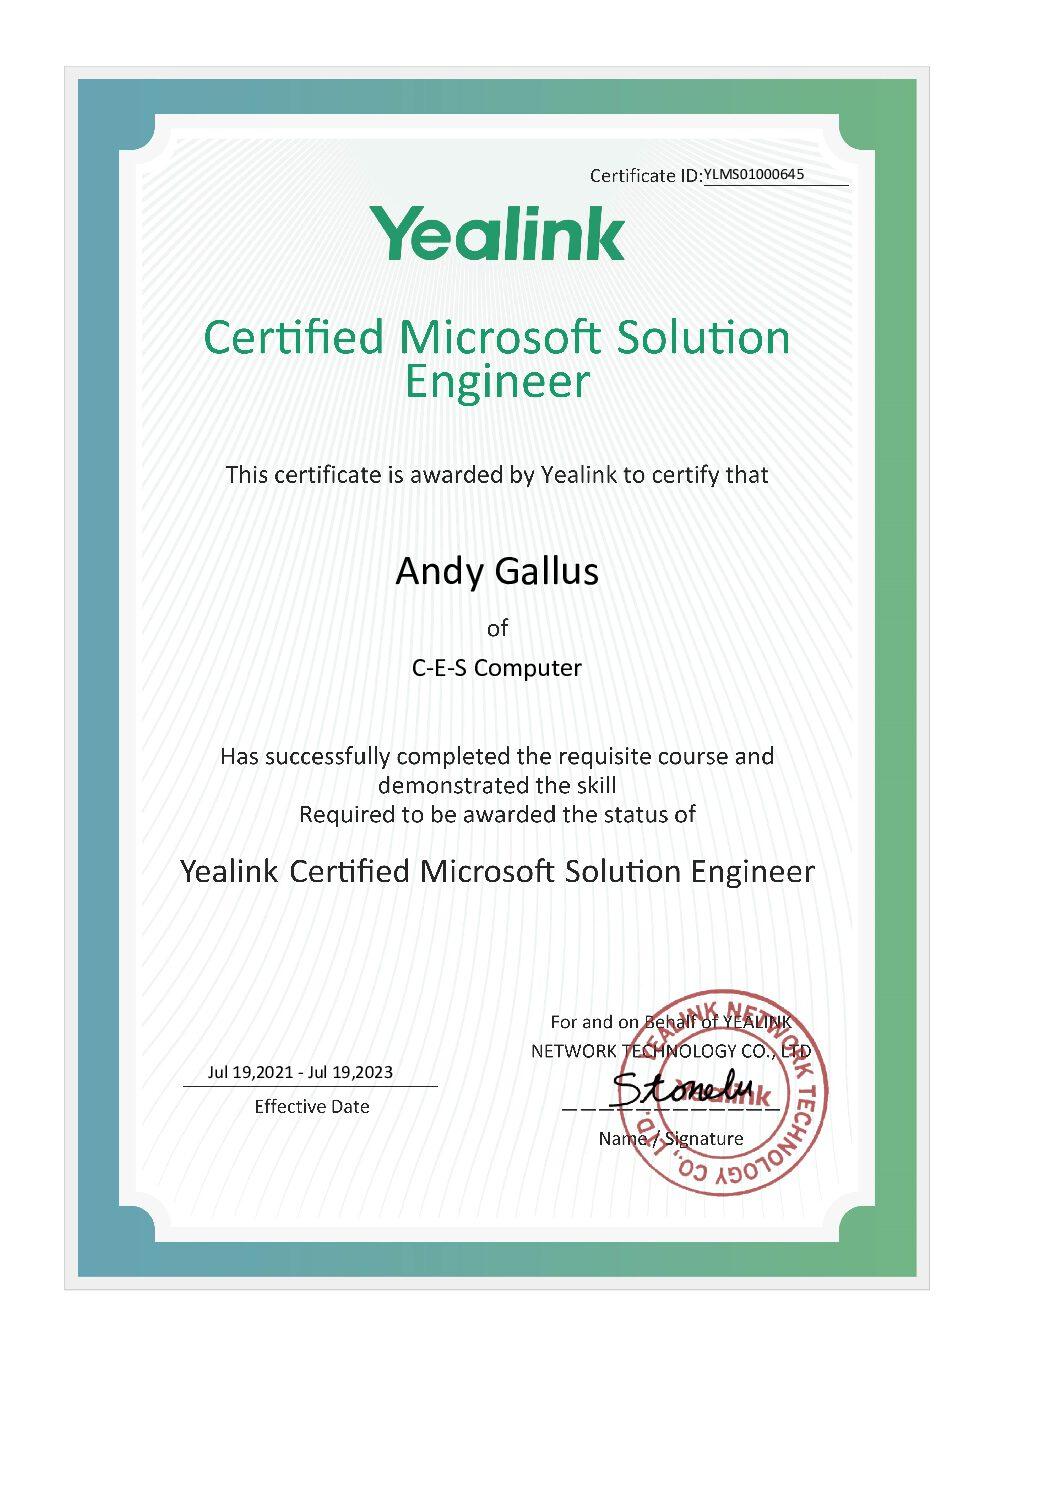 Yealink Certified Microsoft Solution Engineer